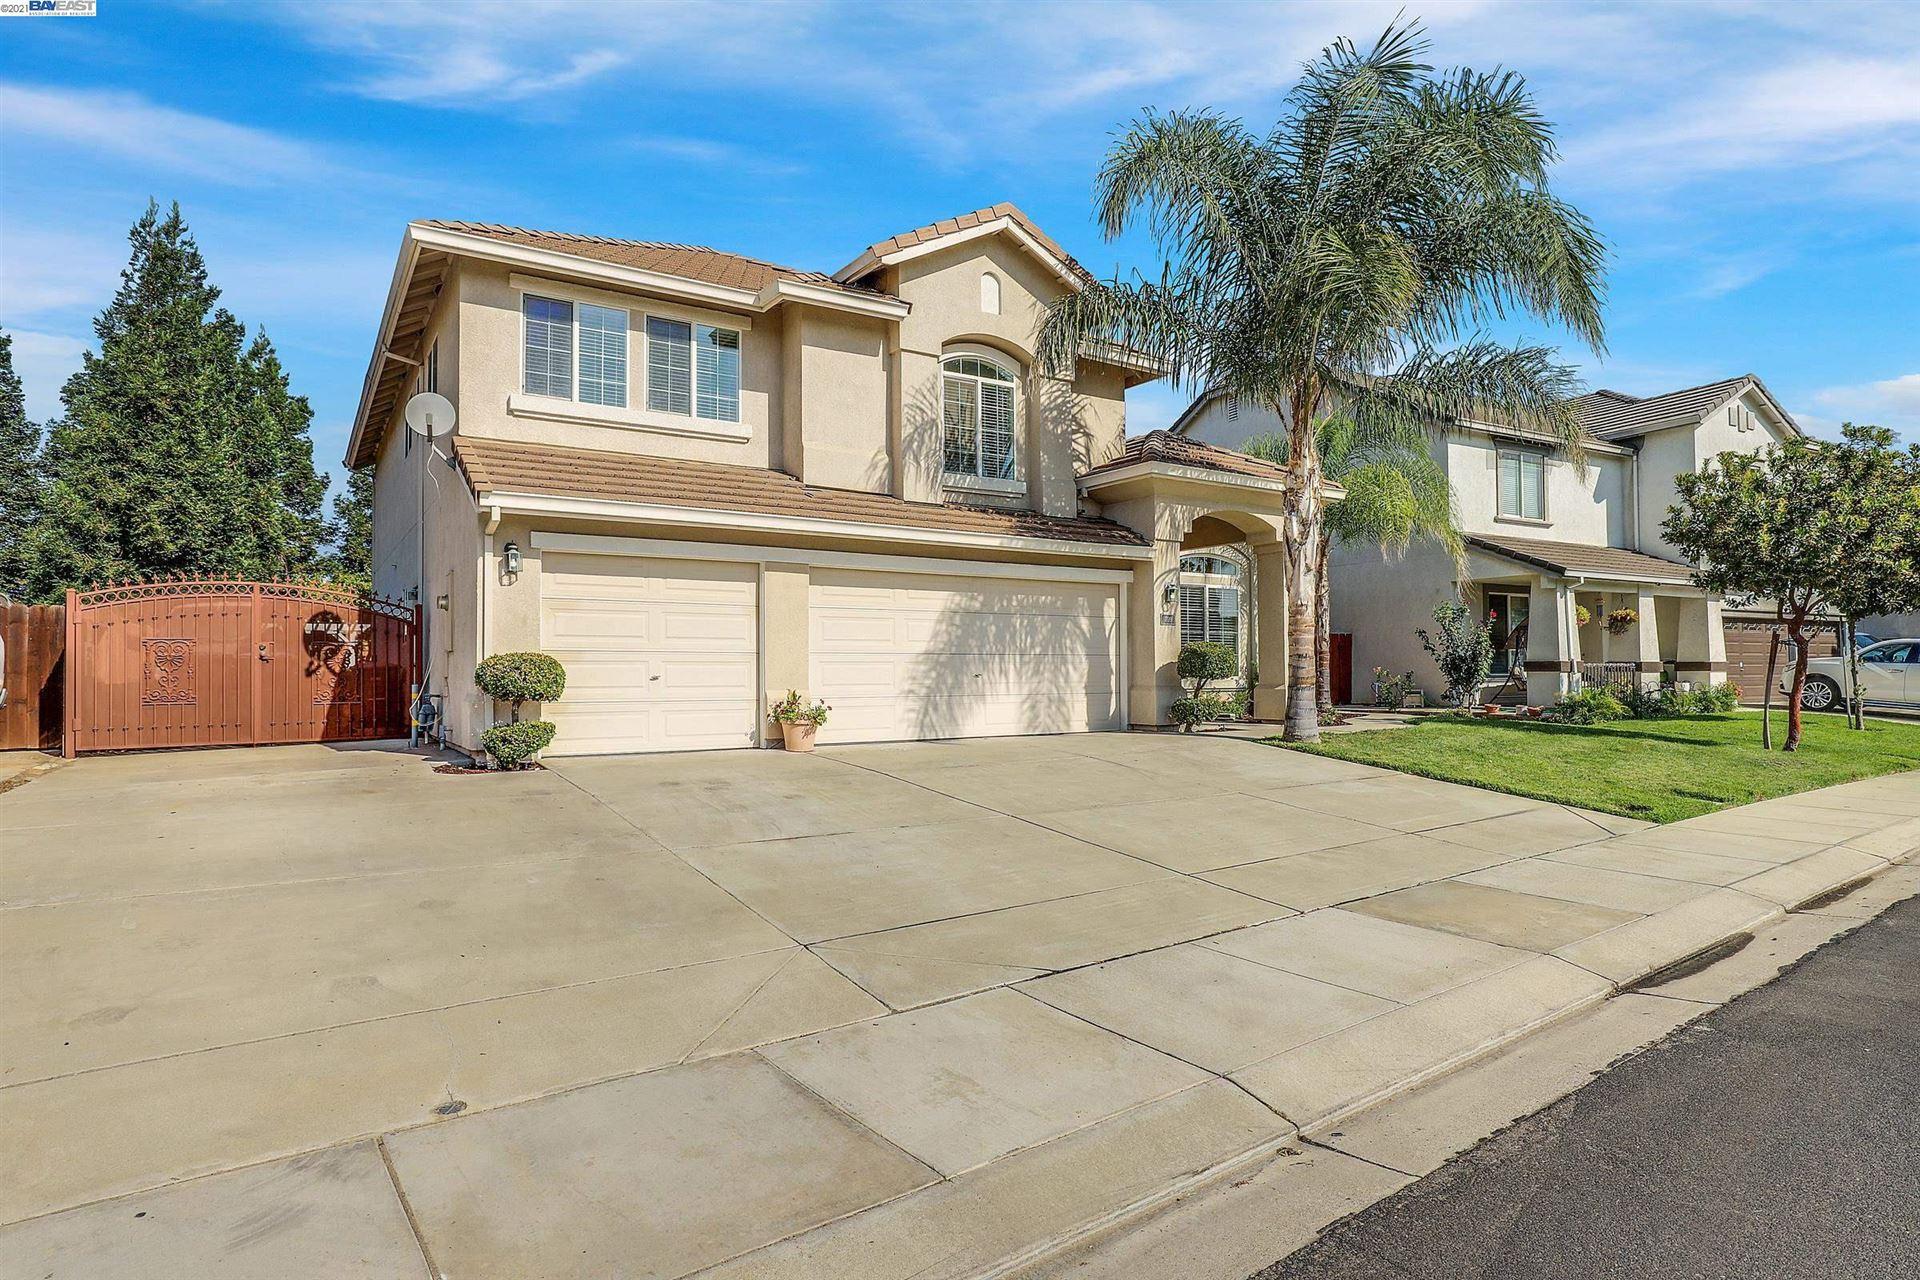 709 Donovan Street, Manteca, CA 95337 - MLS#: 40967736